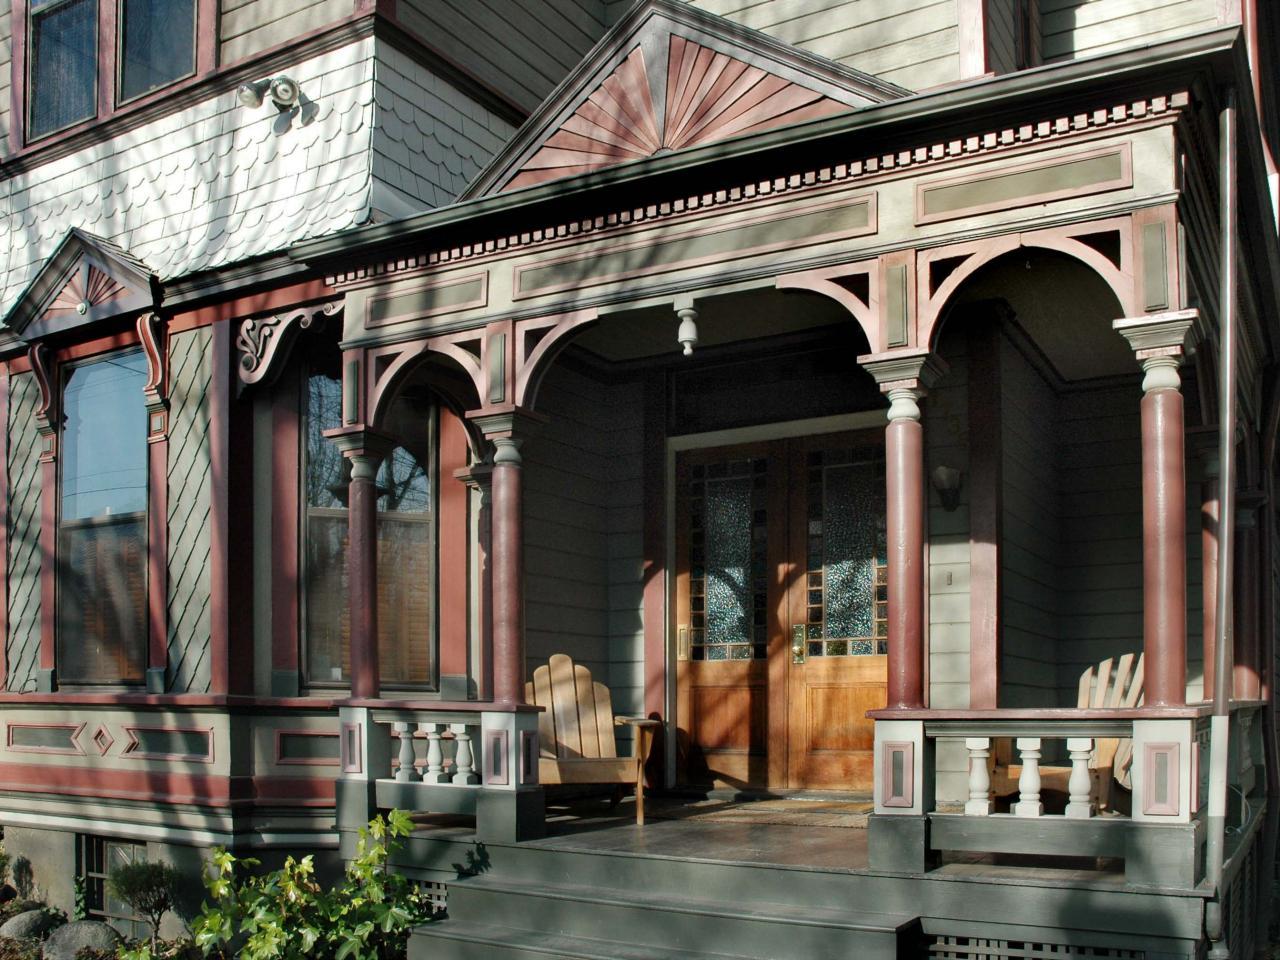 Porches And Home Styles Outdoor Design Landscaping Ideas Porches Decks Patios Hgtv